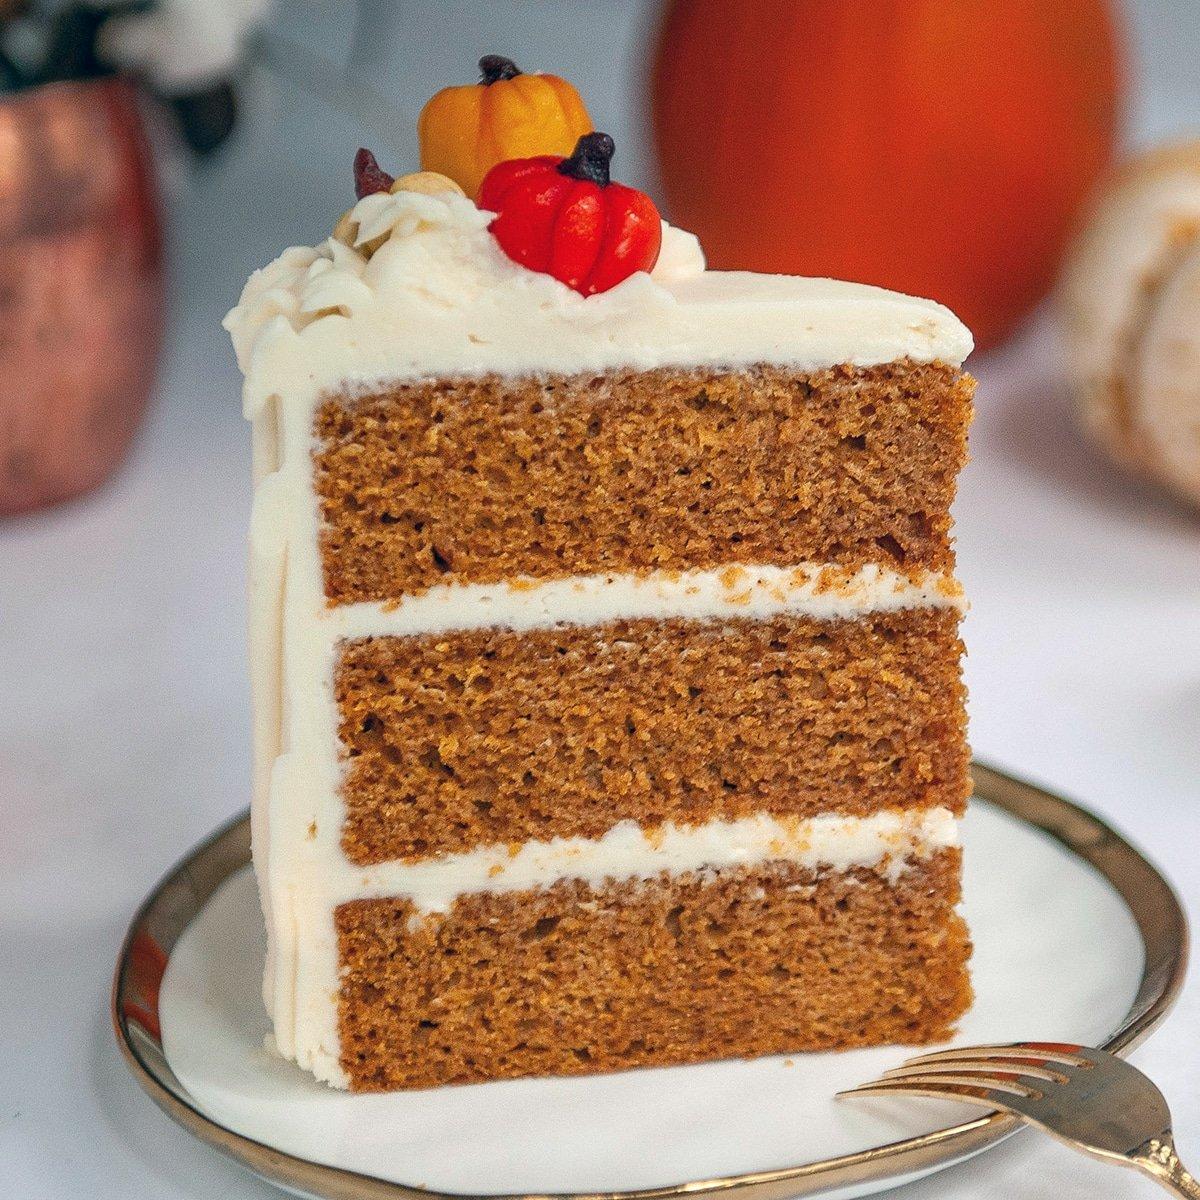 Pumpkin Spice Cake With Cream Cheese Frosting | Sugar Geek Show